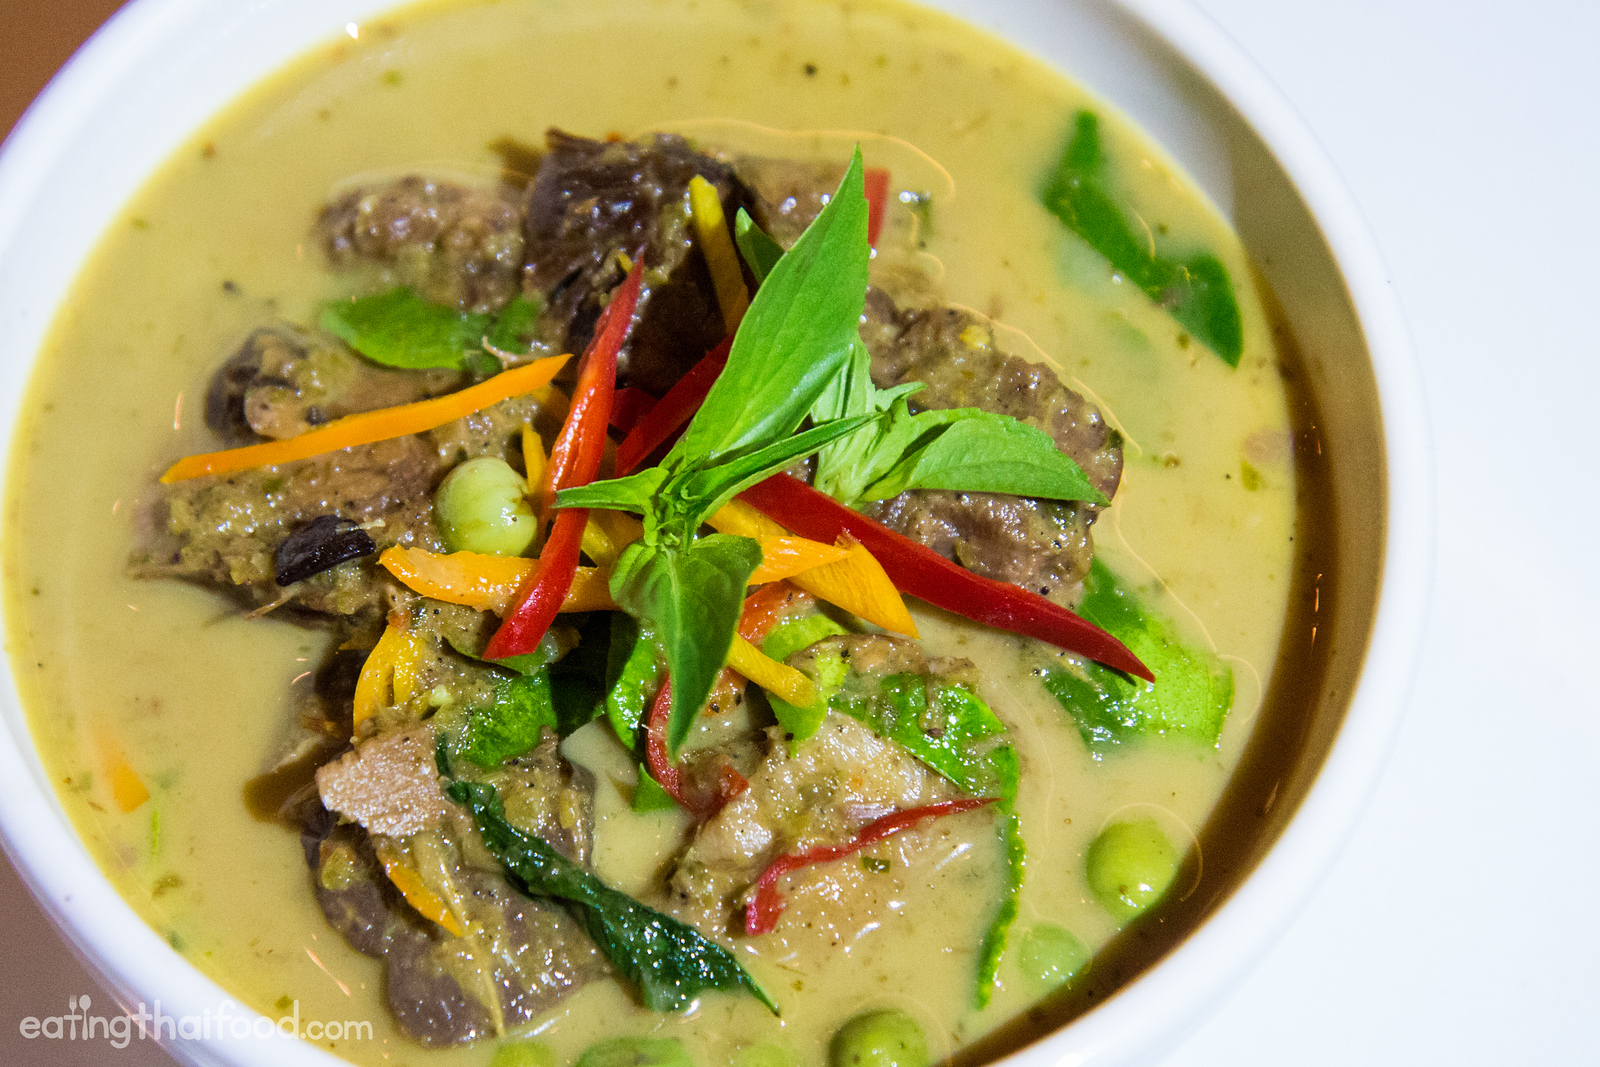 Braised beef green curry (แกงเขียวหวานเนื้อตุ๋น)